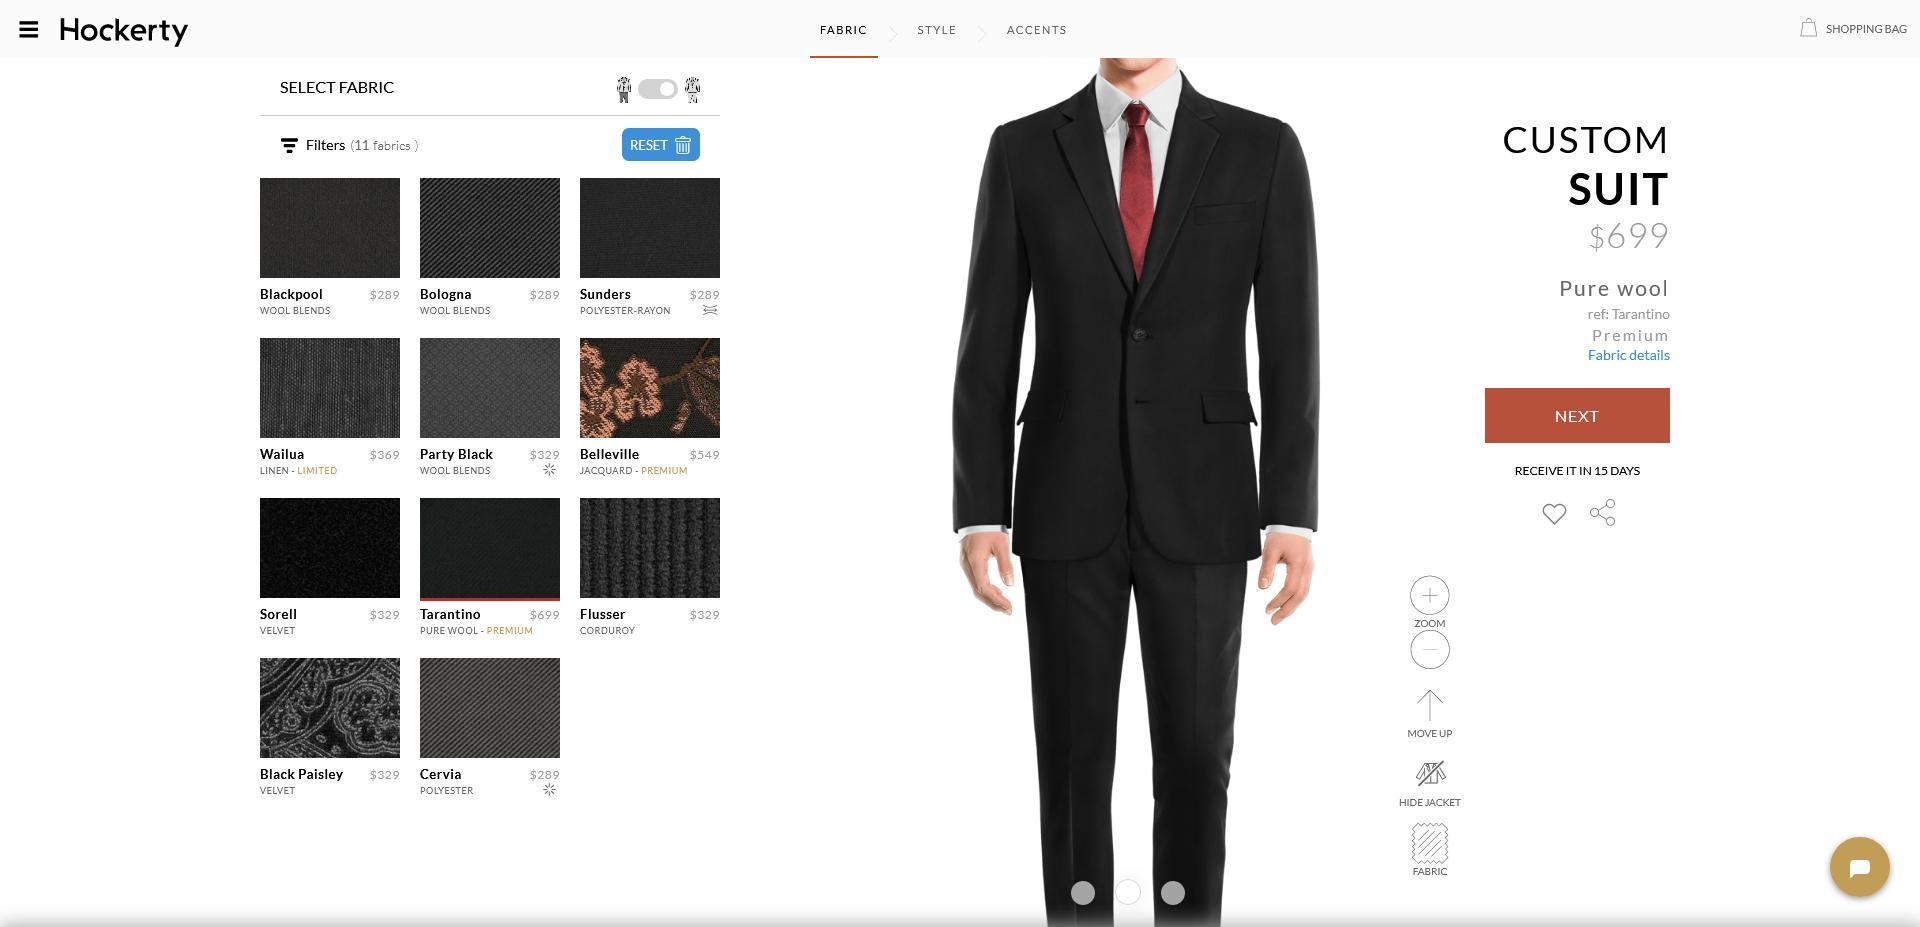 tarantino: black suit fabric from Hockerty